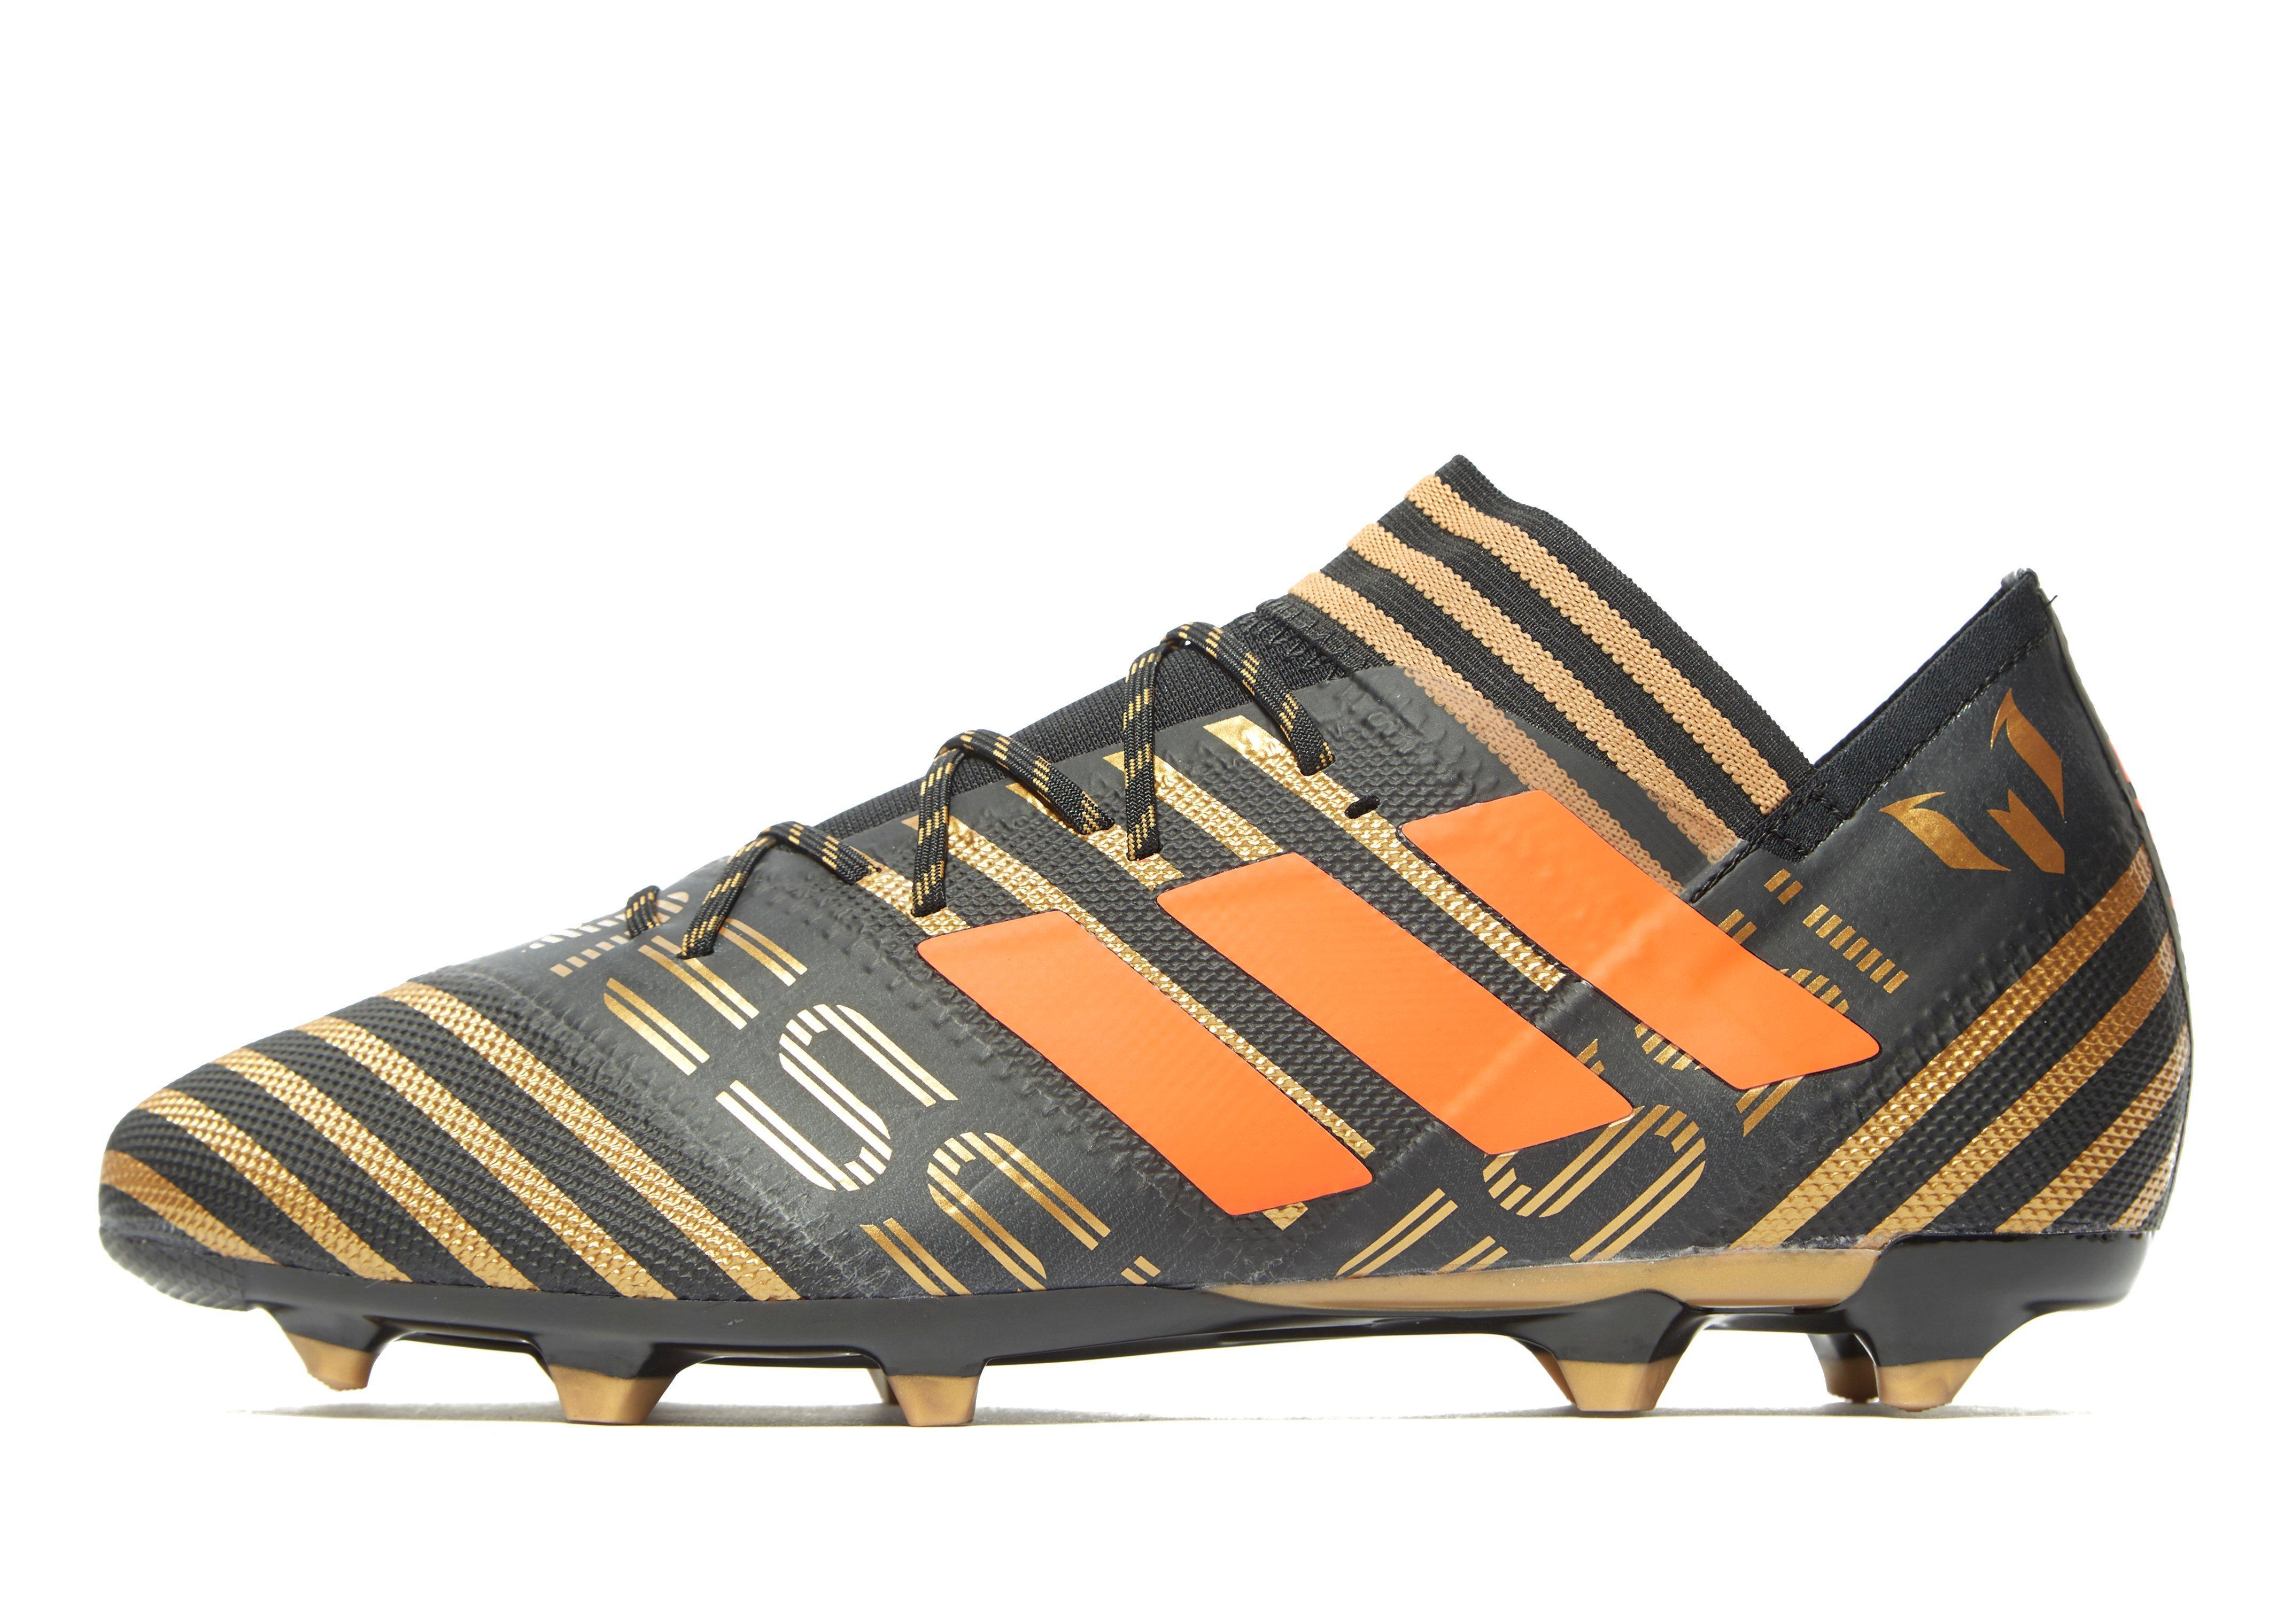 adidas SkyStalker Nemeziz Messi 17.2 FG ...